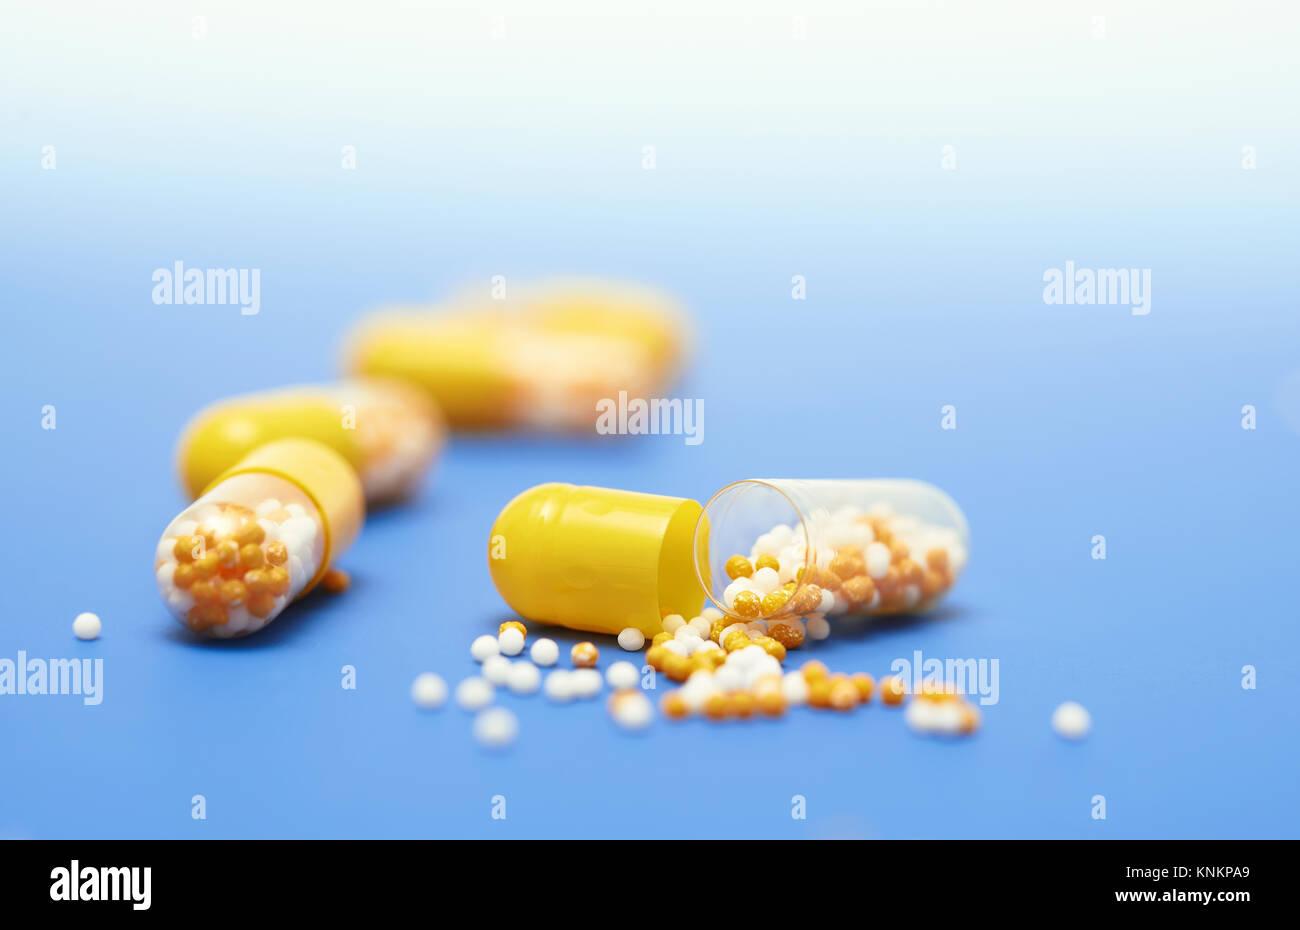 Open Pill Capsule Stock Photos & Open Pill Capsule Stock ...